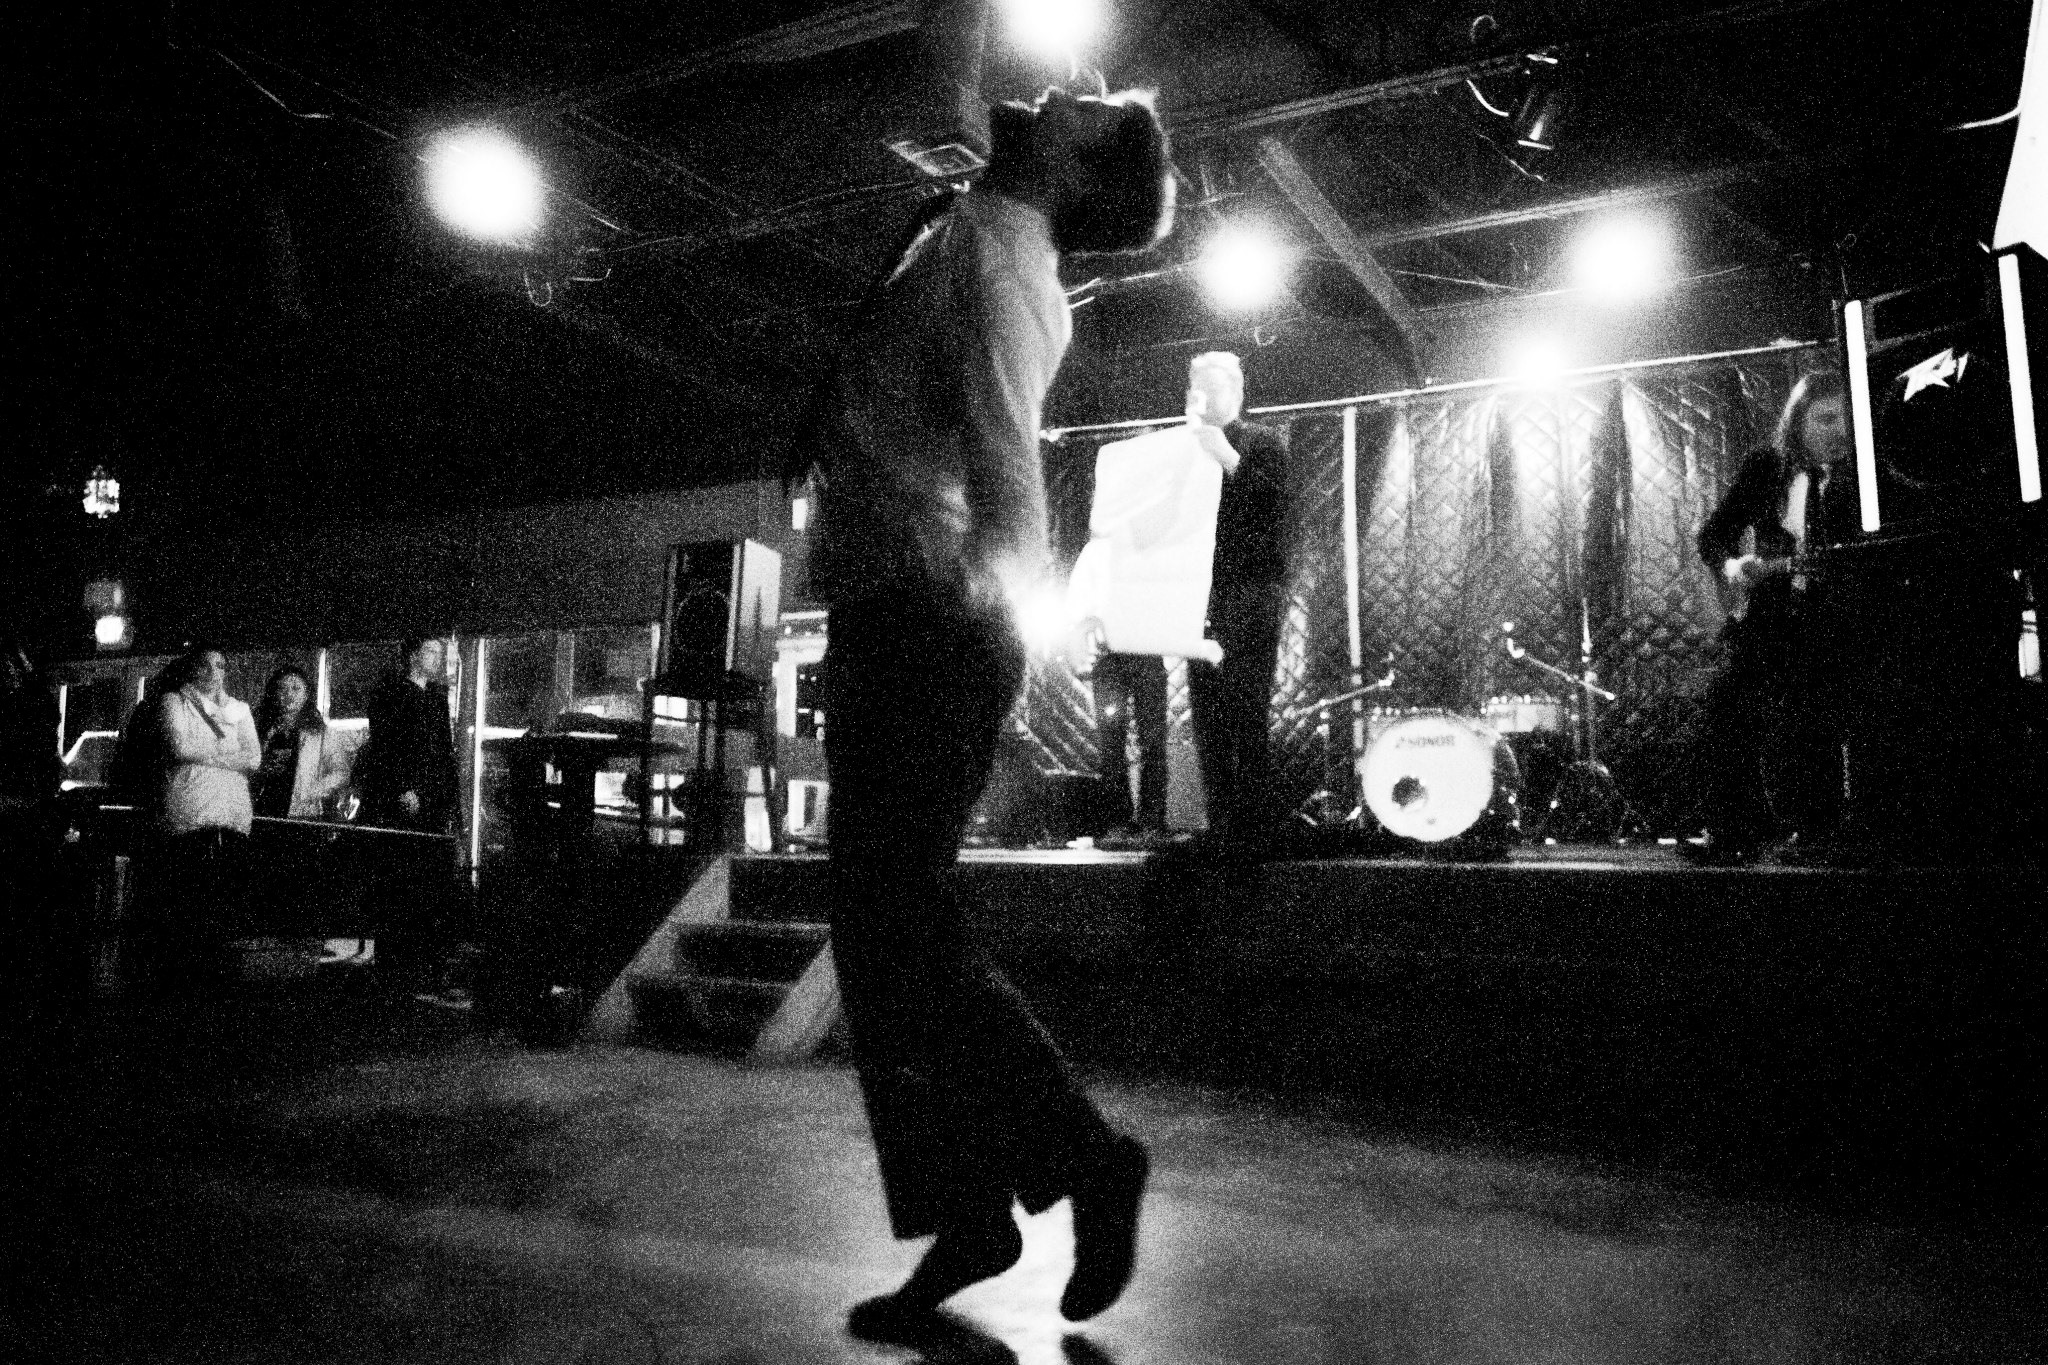 Eric Mullis, Matt Cosper, Troy Conn.   Neighborhood Theatre (Charlotte, NC) on 11/20/14.